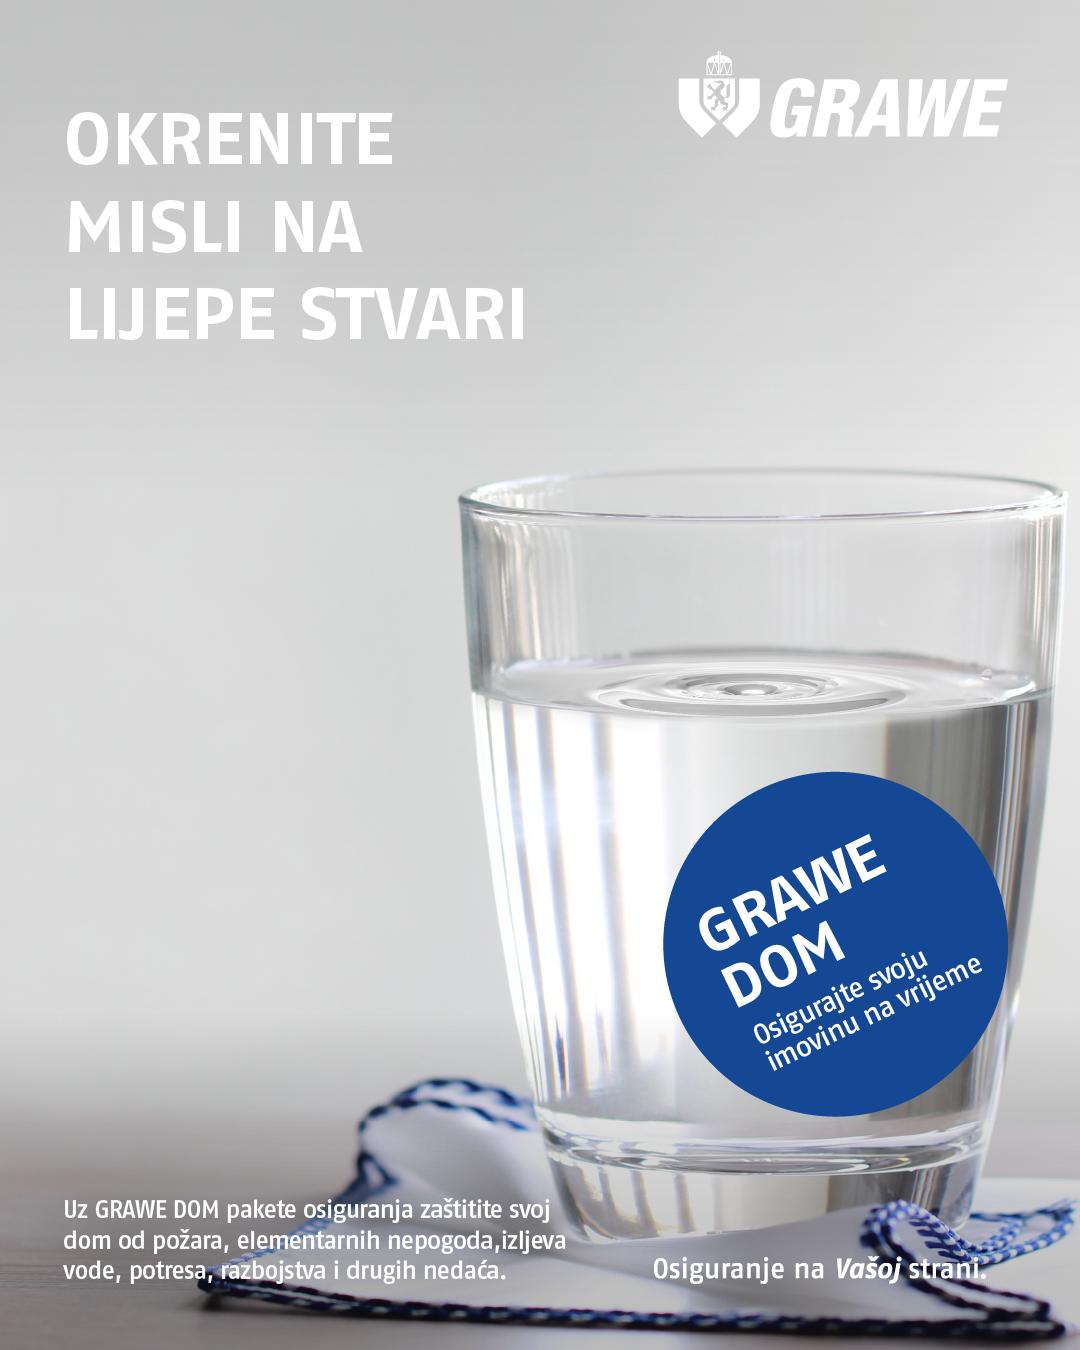 GRAWE DOM kampanja potres